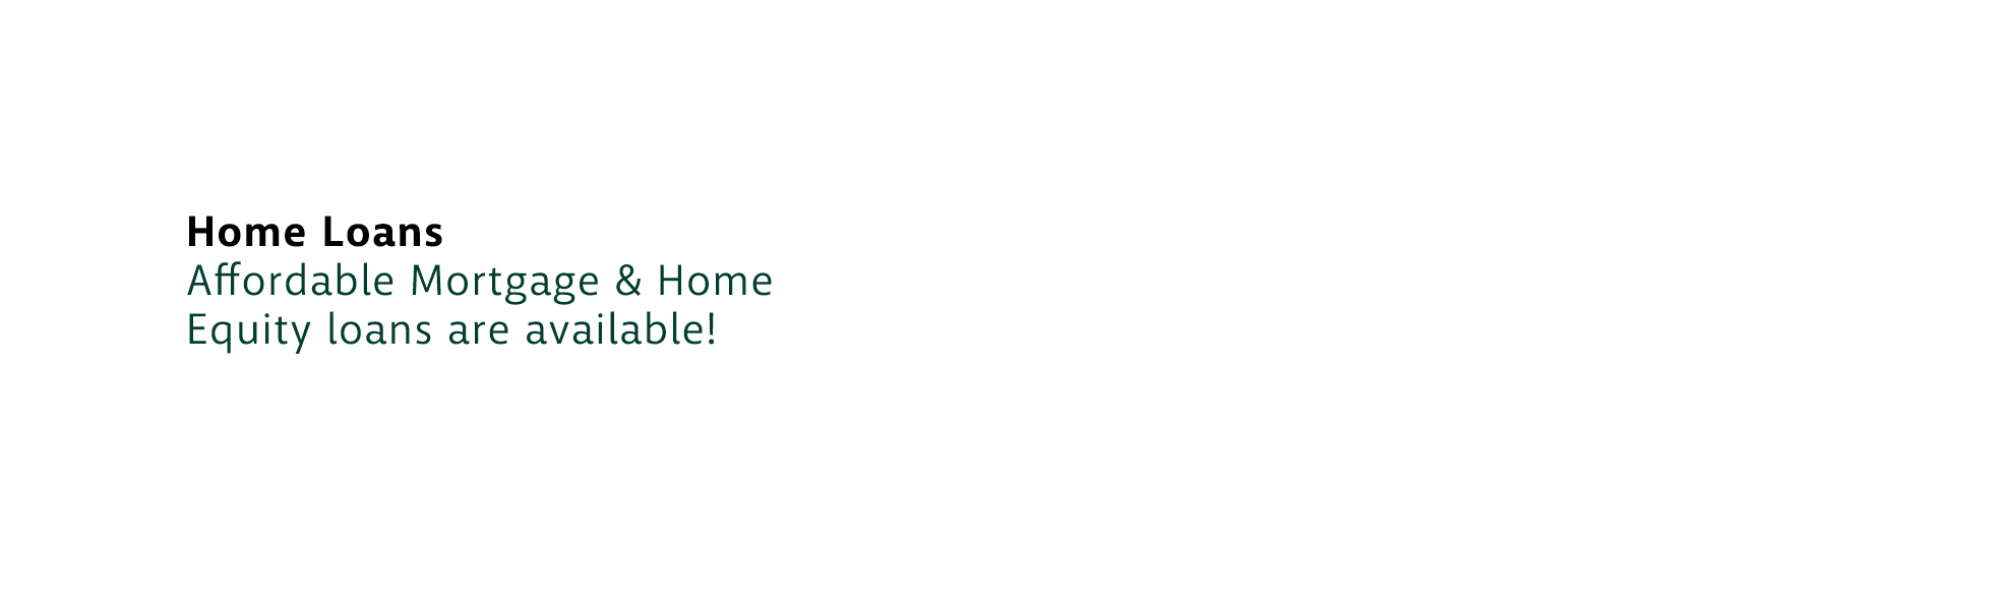 banner-home-loan